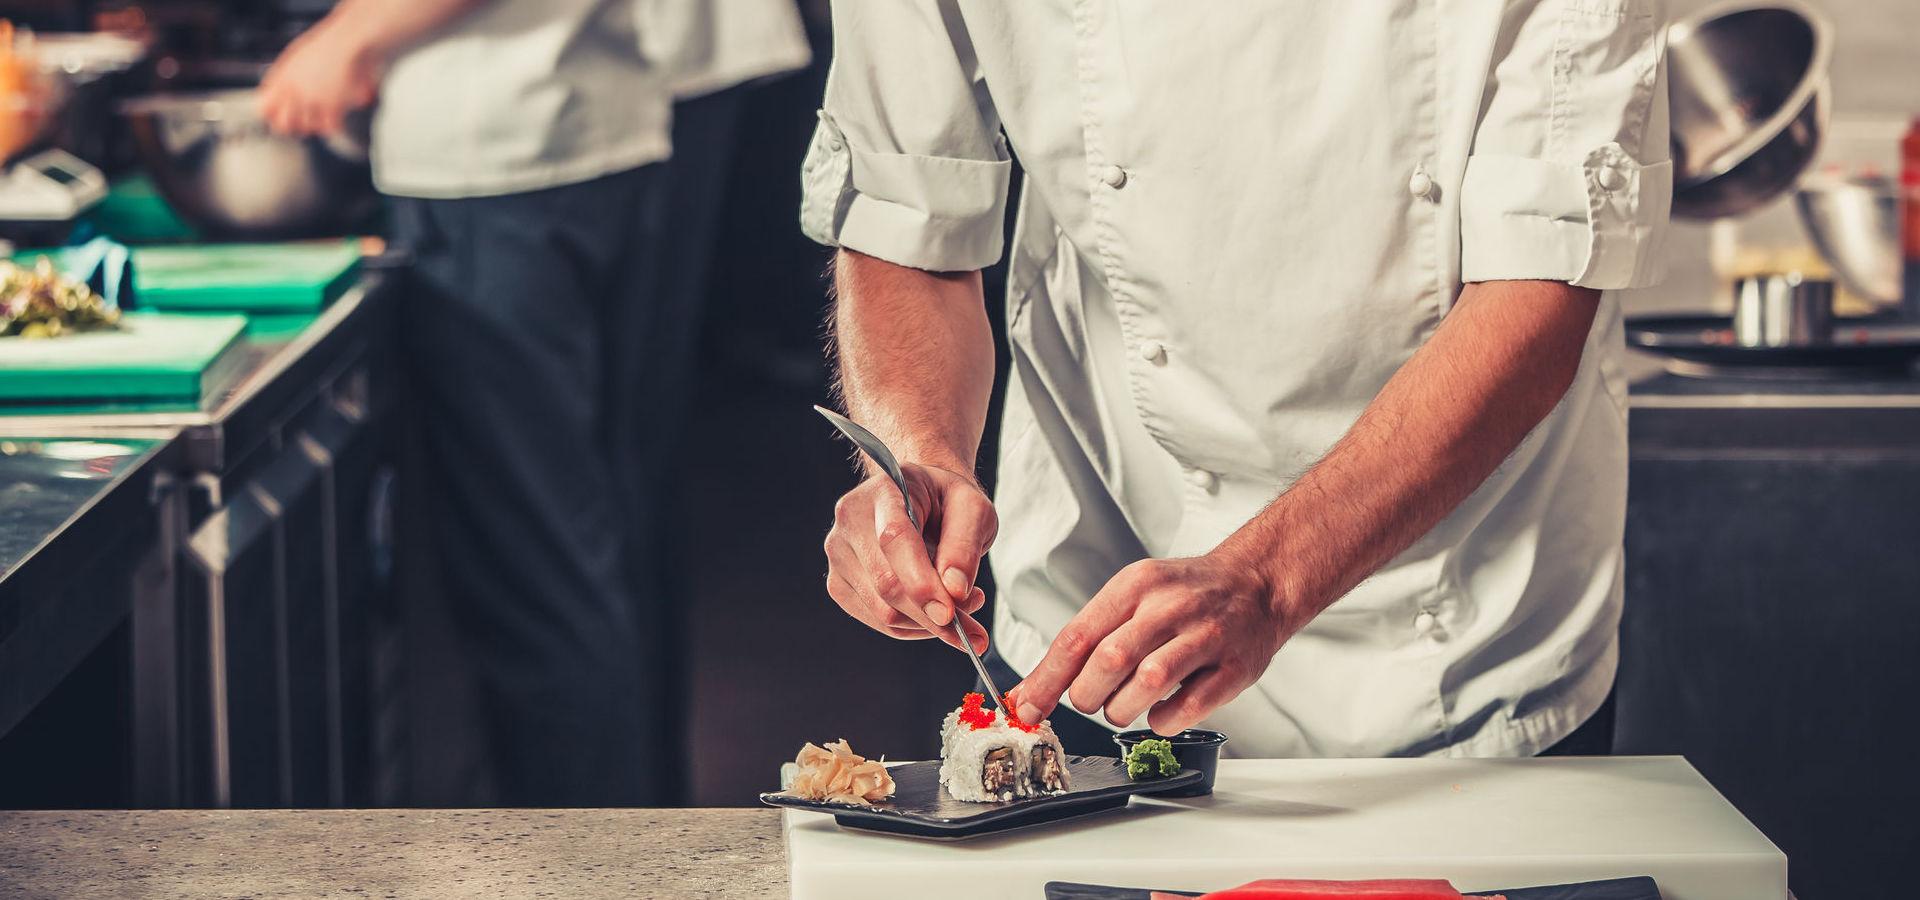 Keys to marketing your restaurant